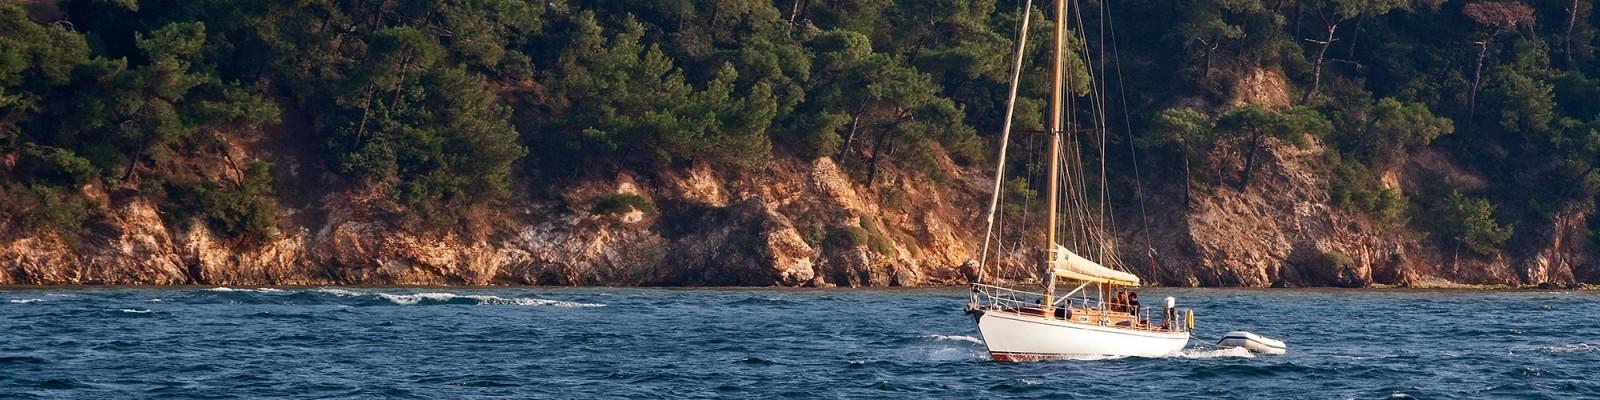 Tenrag Yacht Charter: Turkey